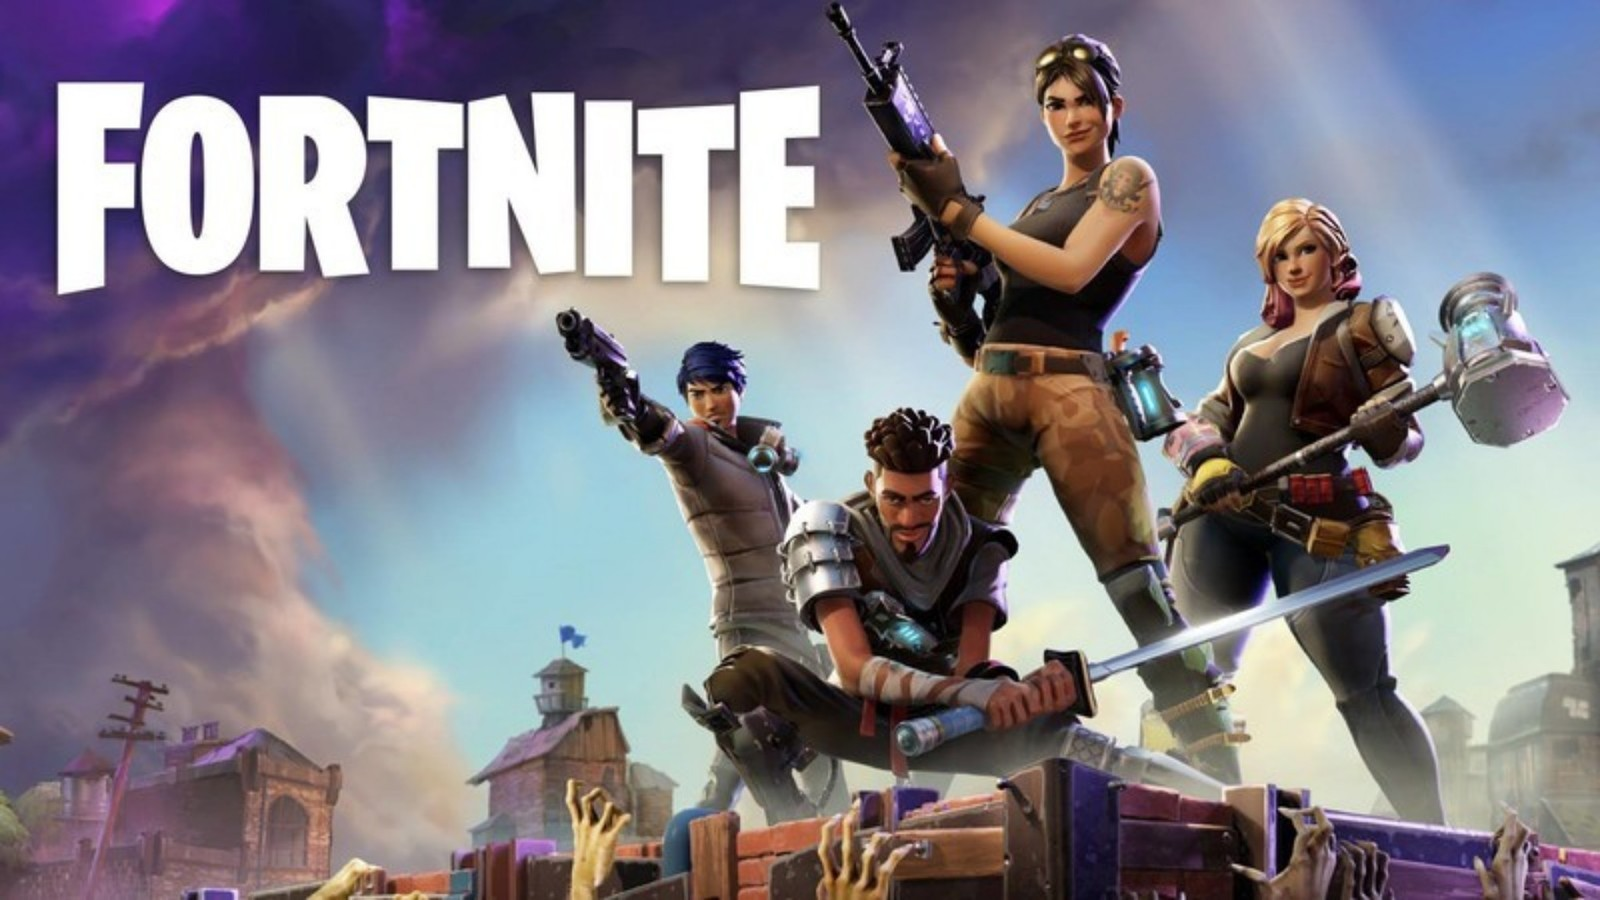 'Fortnite' Devs Detail Their Philosophy on the 'Fortnite' Metagame